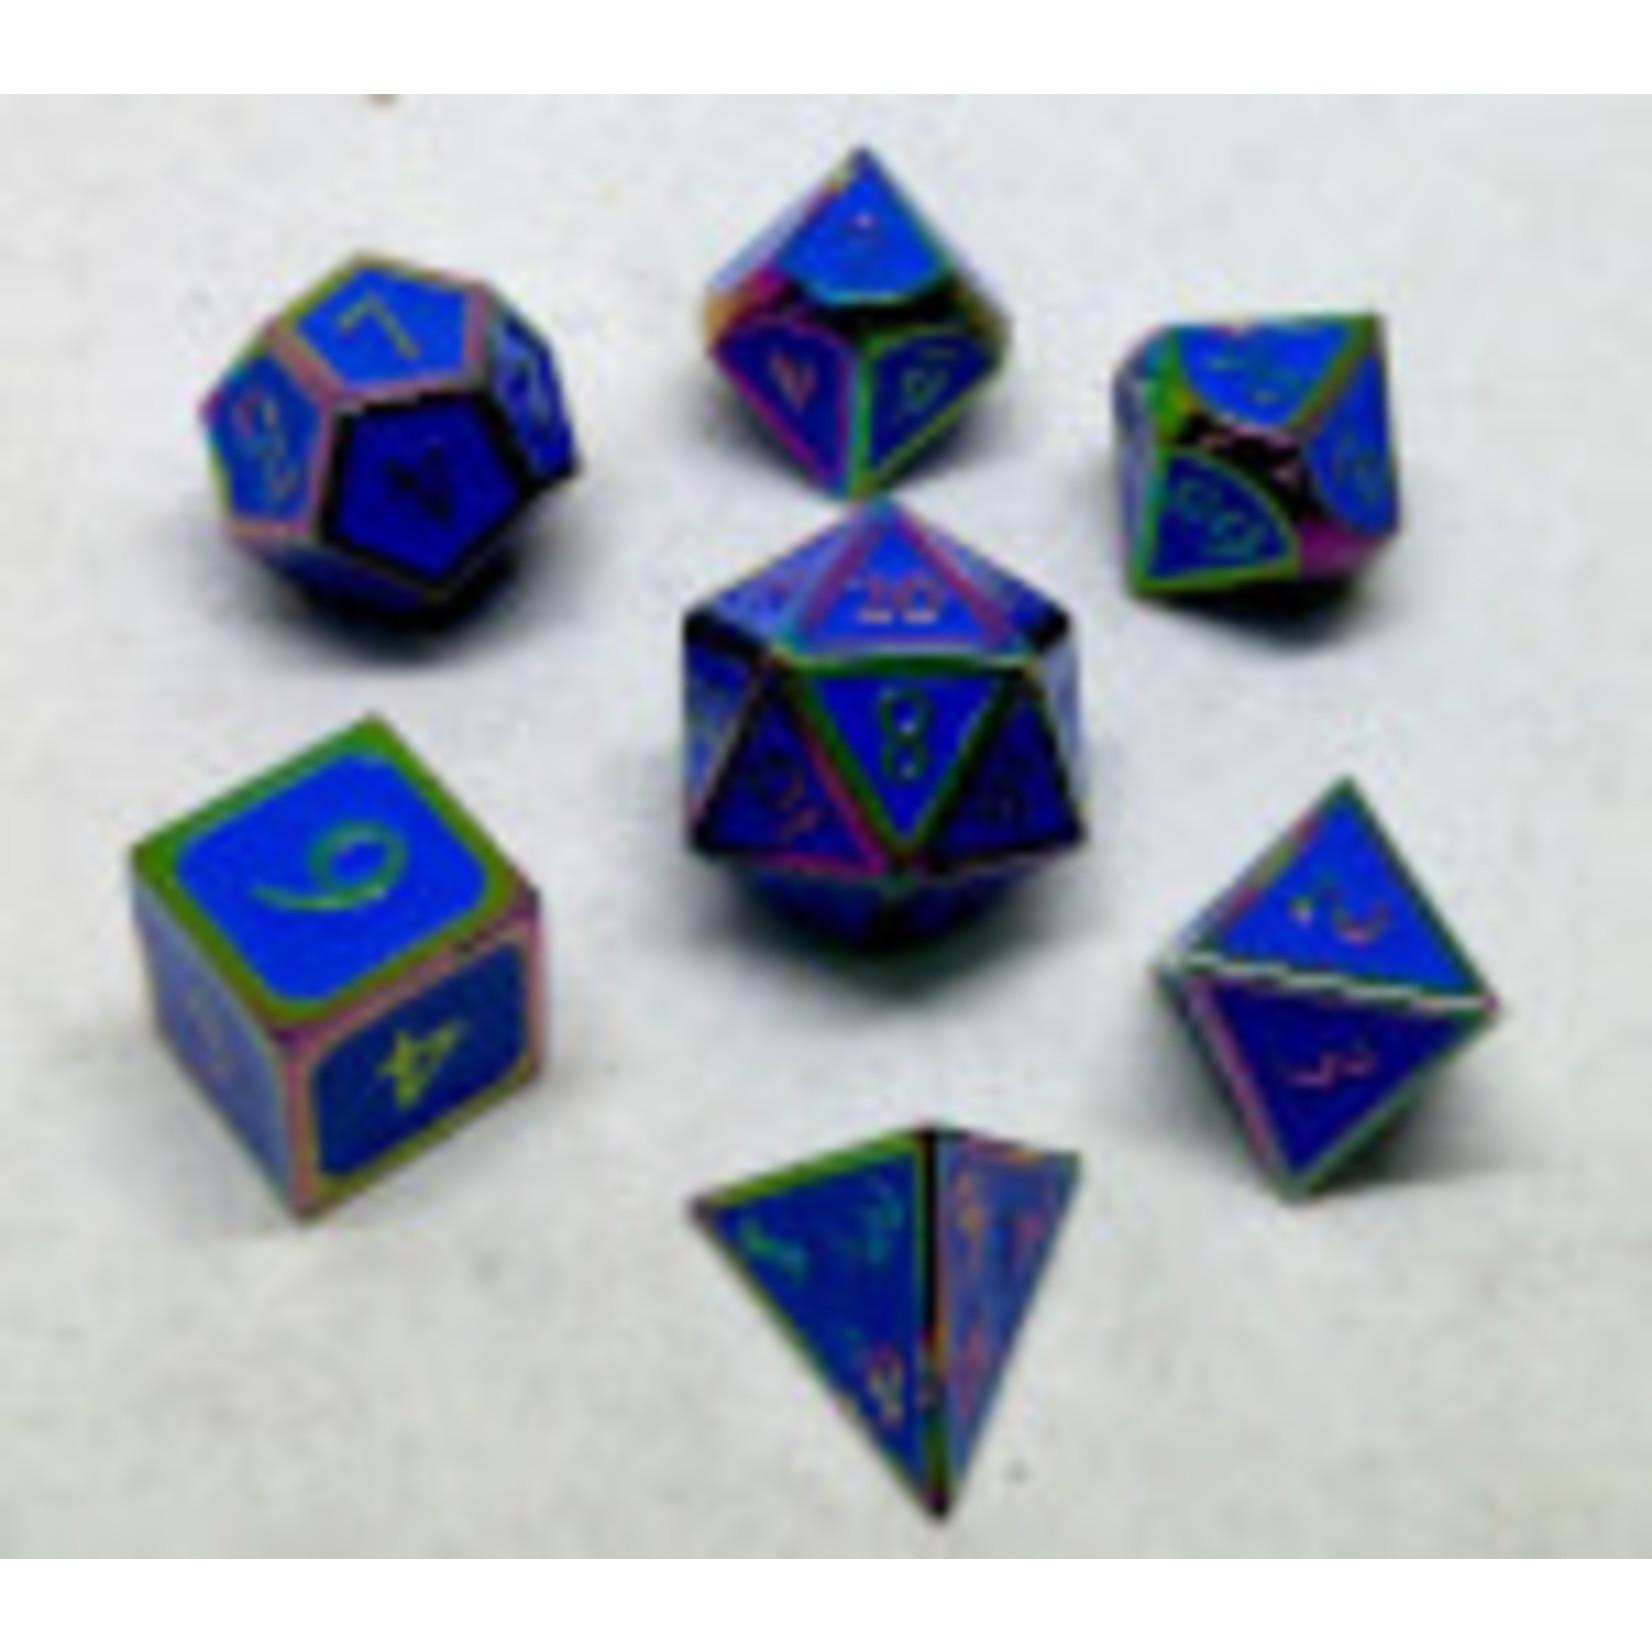 Metallic Dice Game Set 7D Metallic Rainbow/Blue Enamel